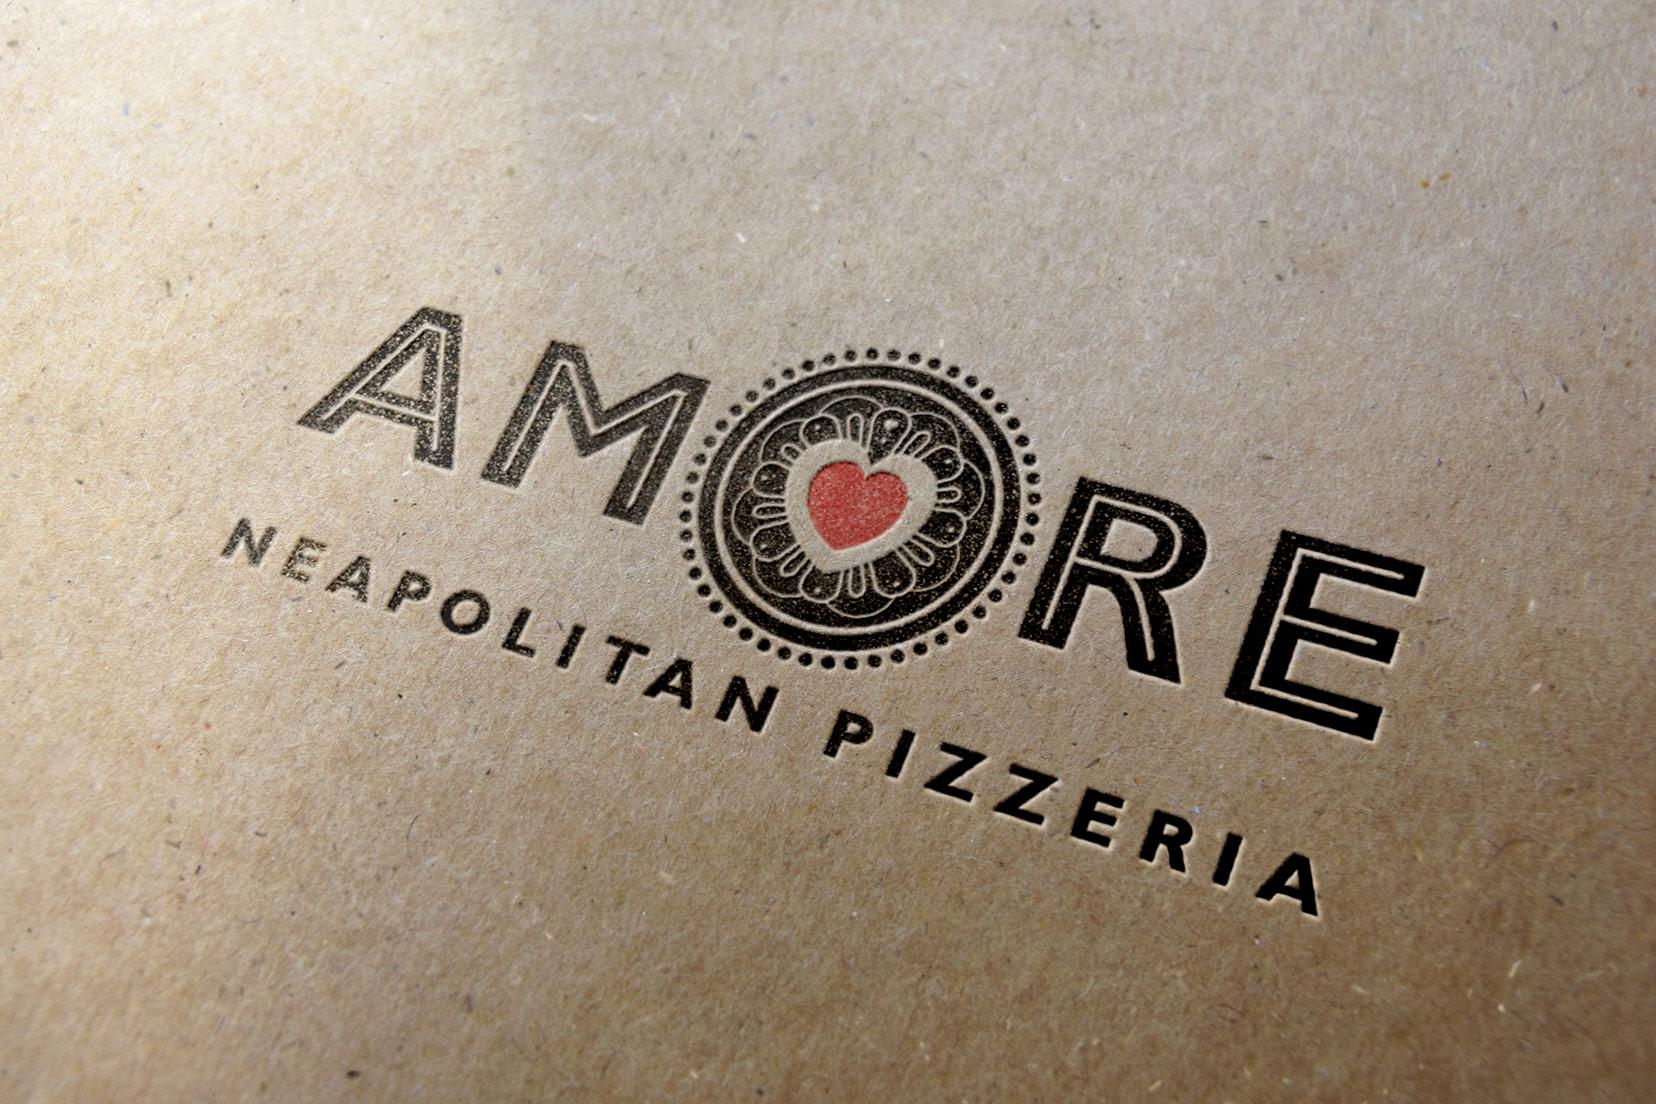 Amore Neapolitan Pizza